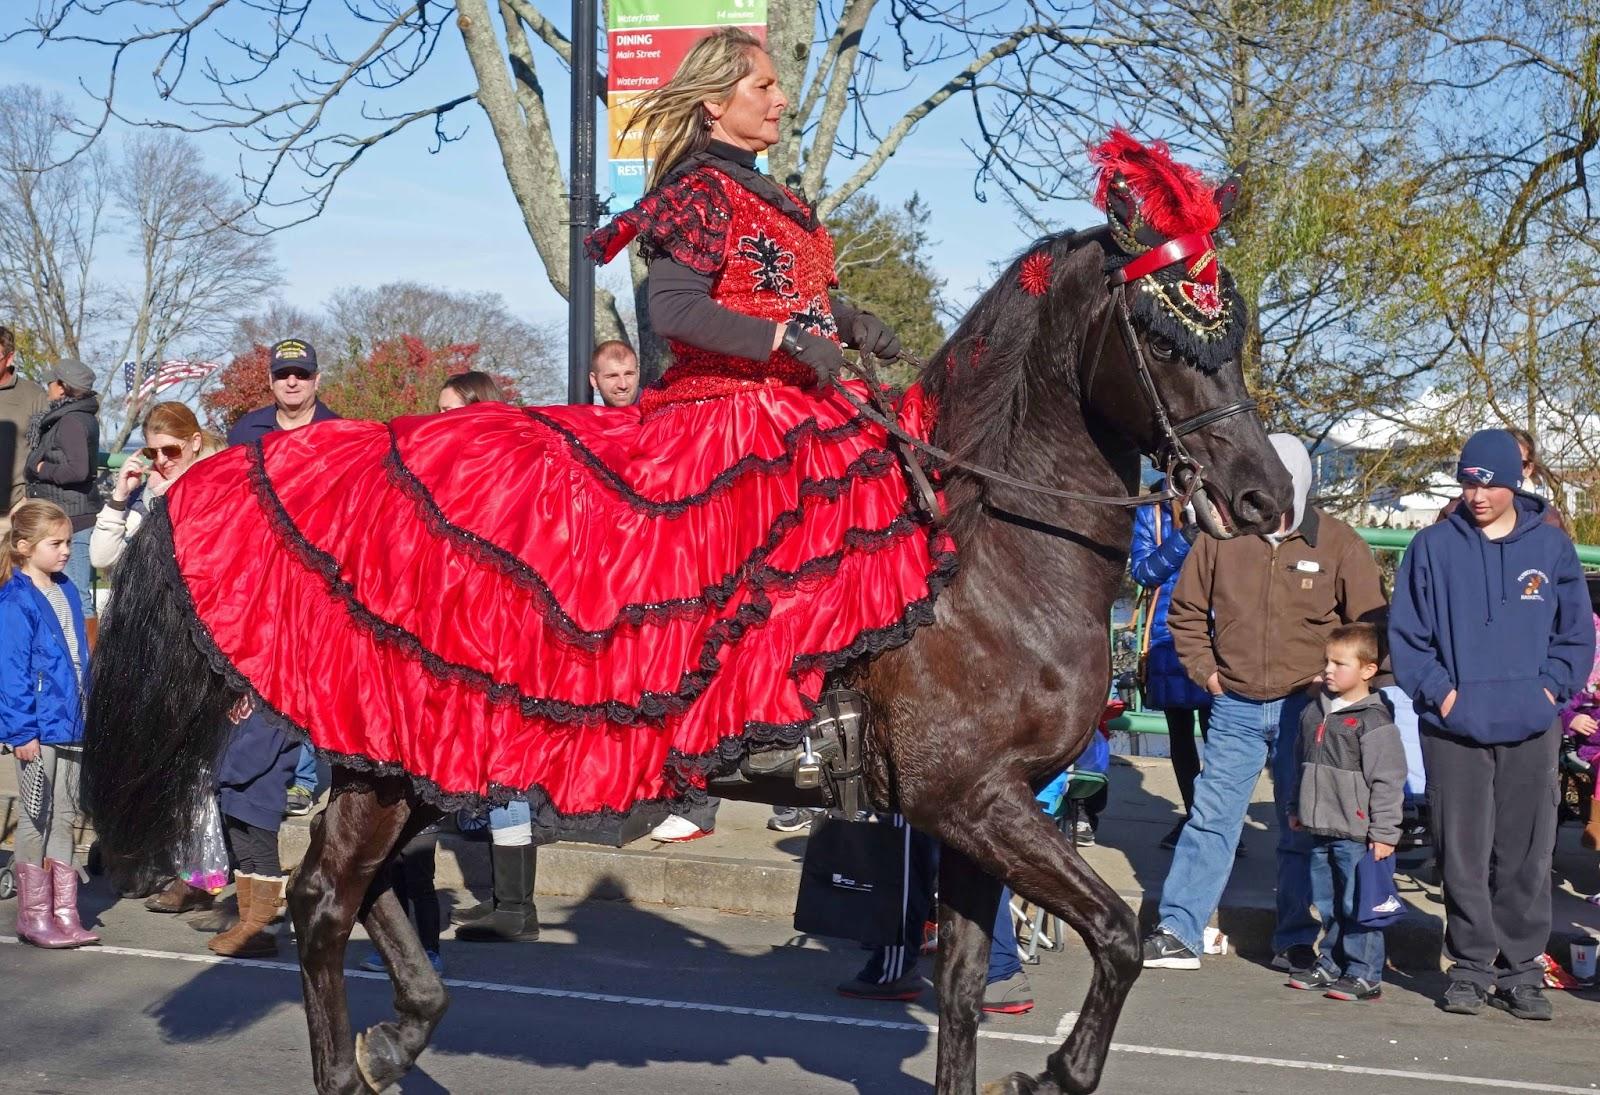 Joe S Retirement Blog Thanksgiving Parade America S